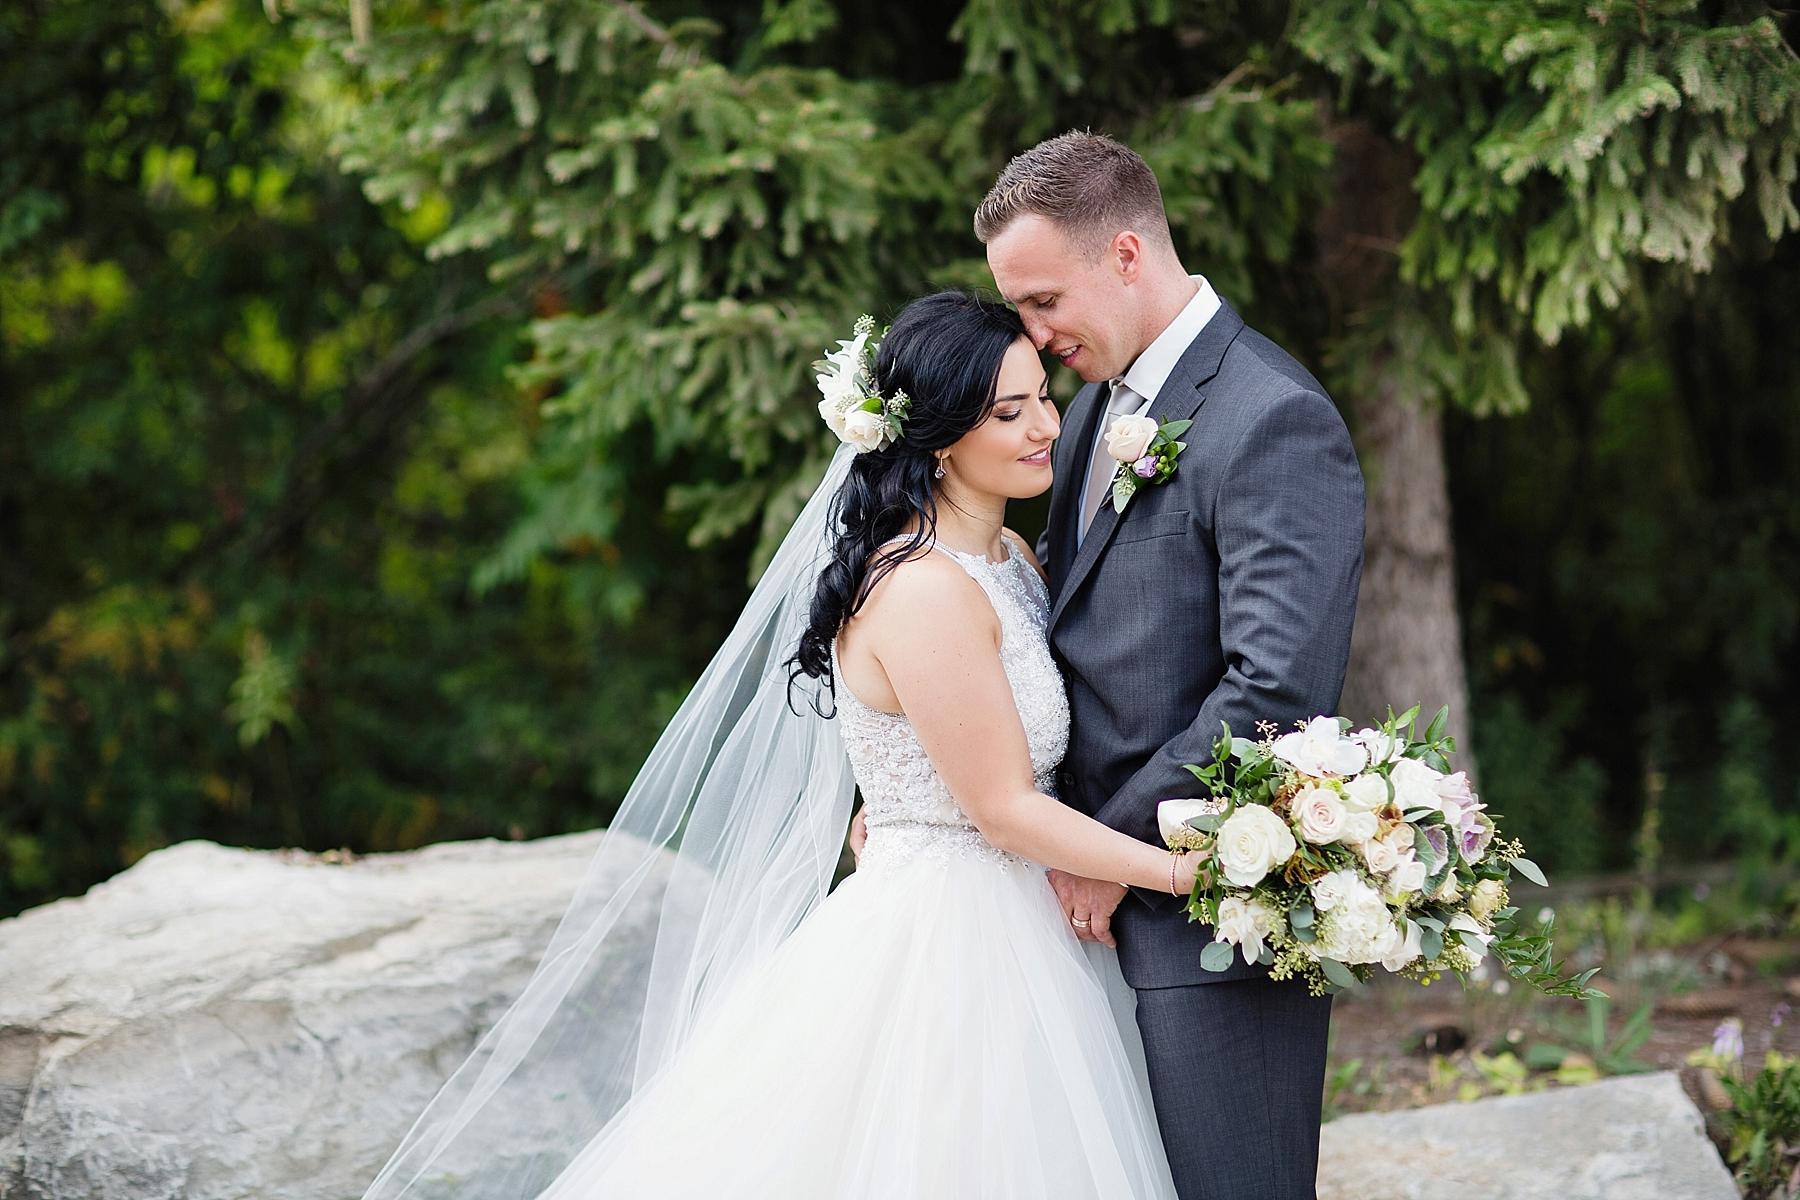 windsor-wedding-photographer-sprucewood-shores-winery-wedding-niagara-on-the-lake-wedding-photographer-eryn-shea-photography_0001.jpg